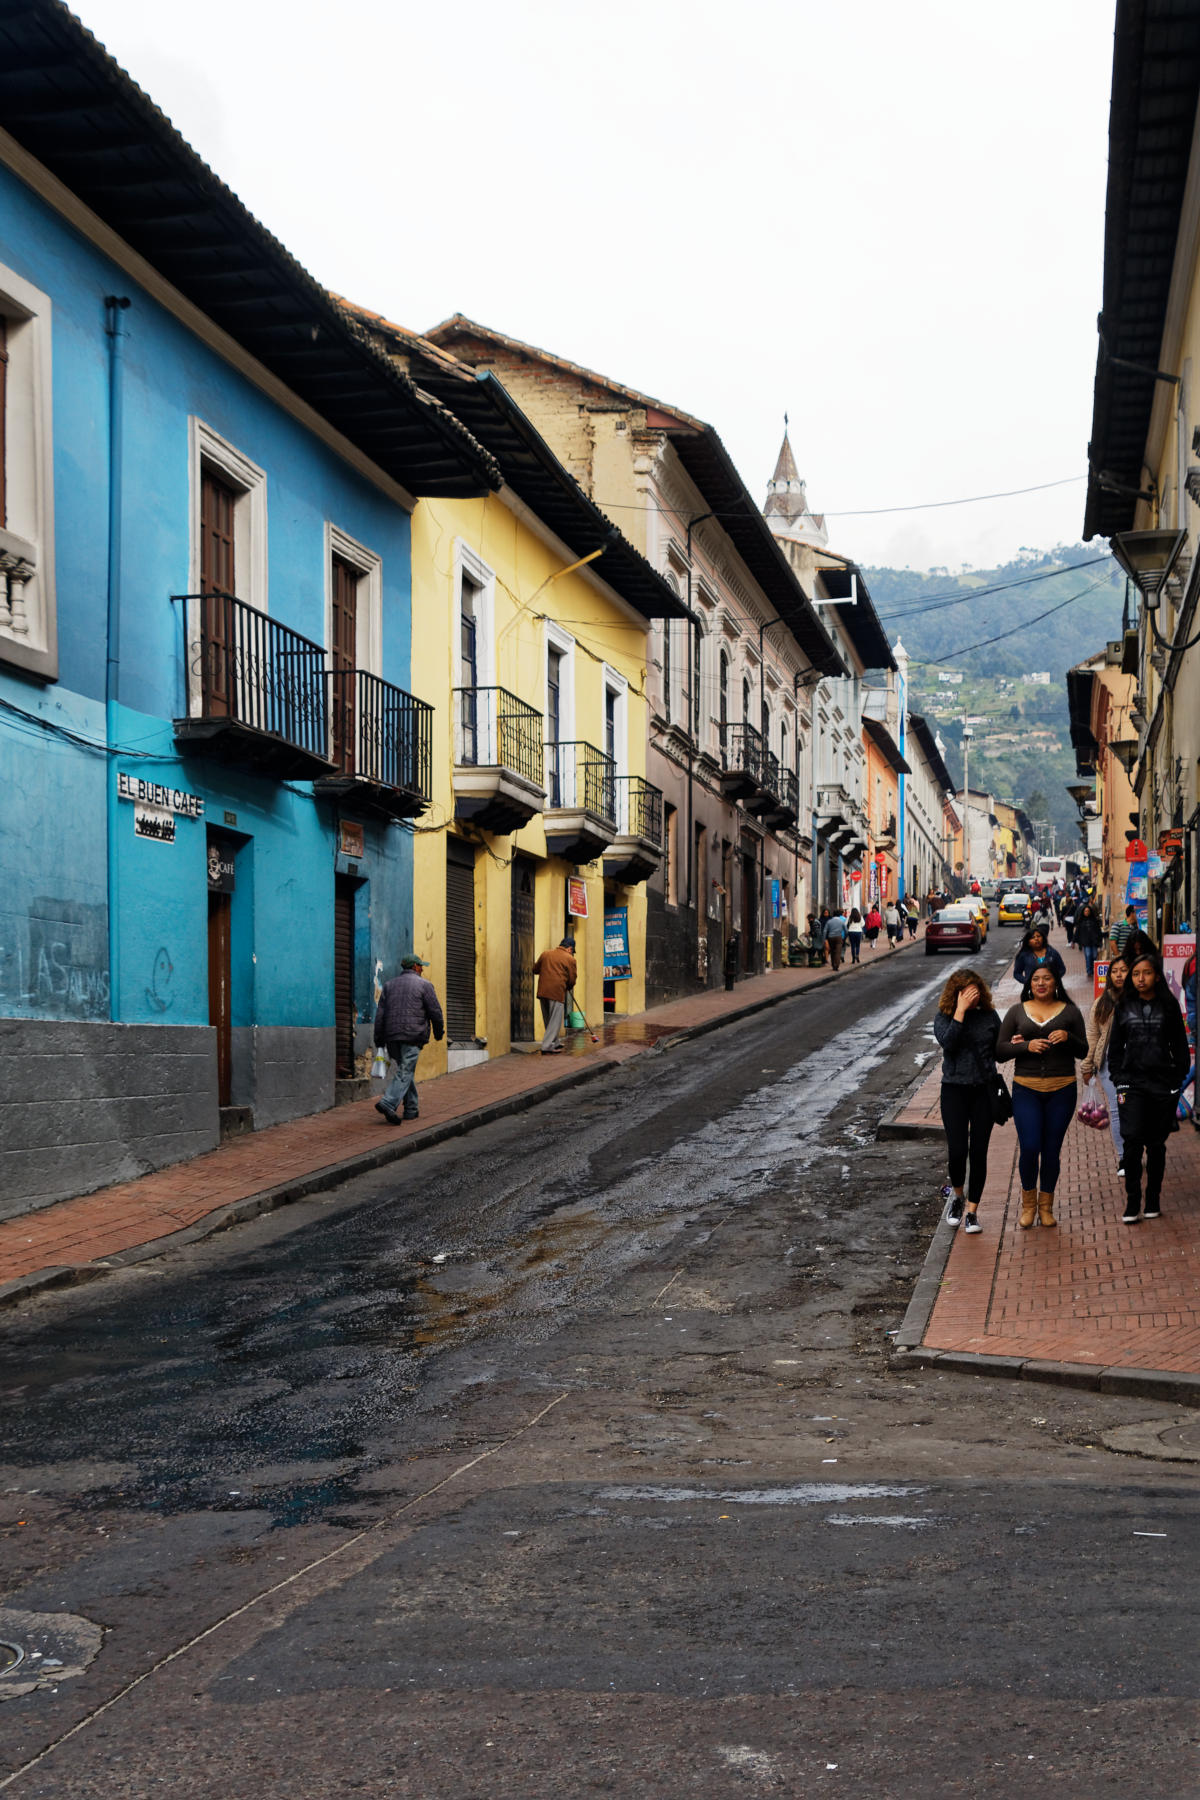 Street scene in Quito